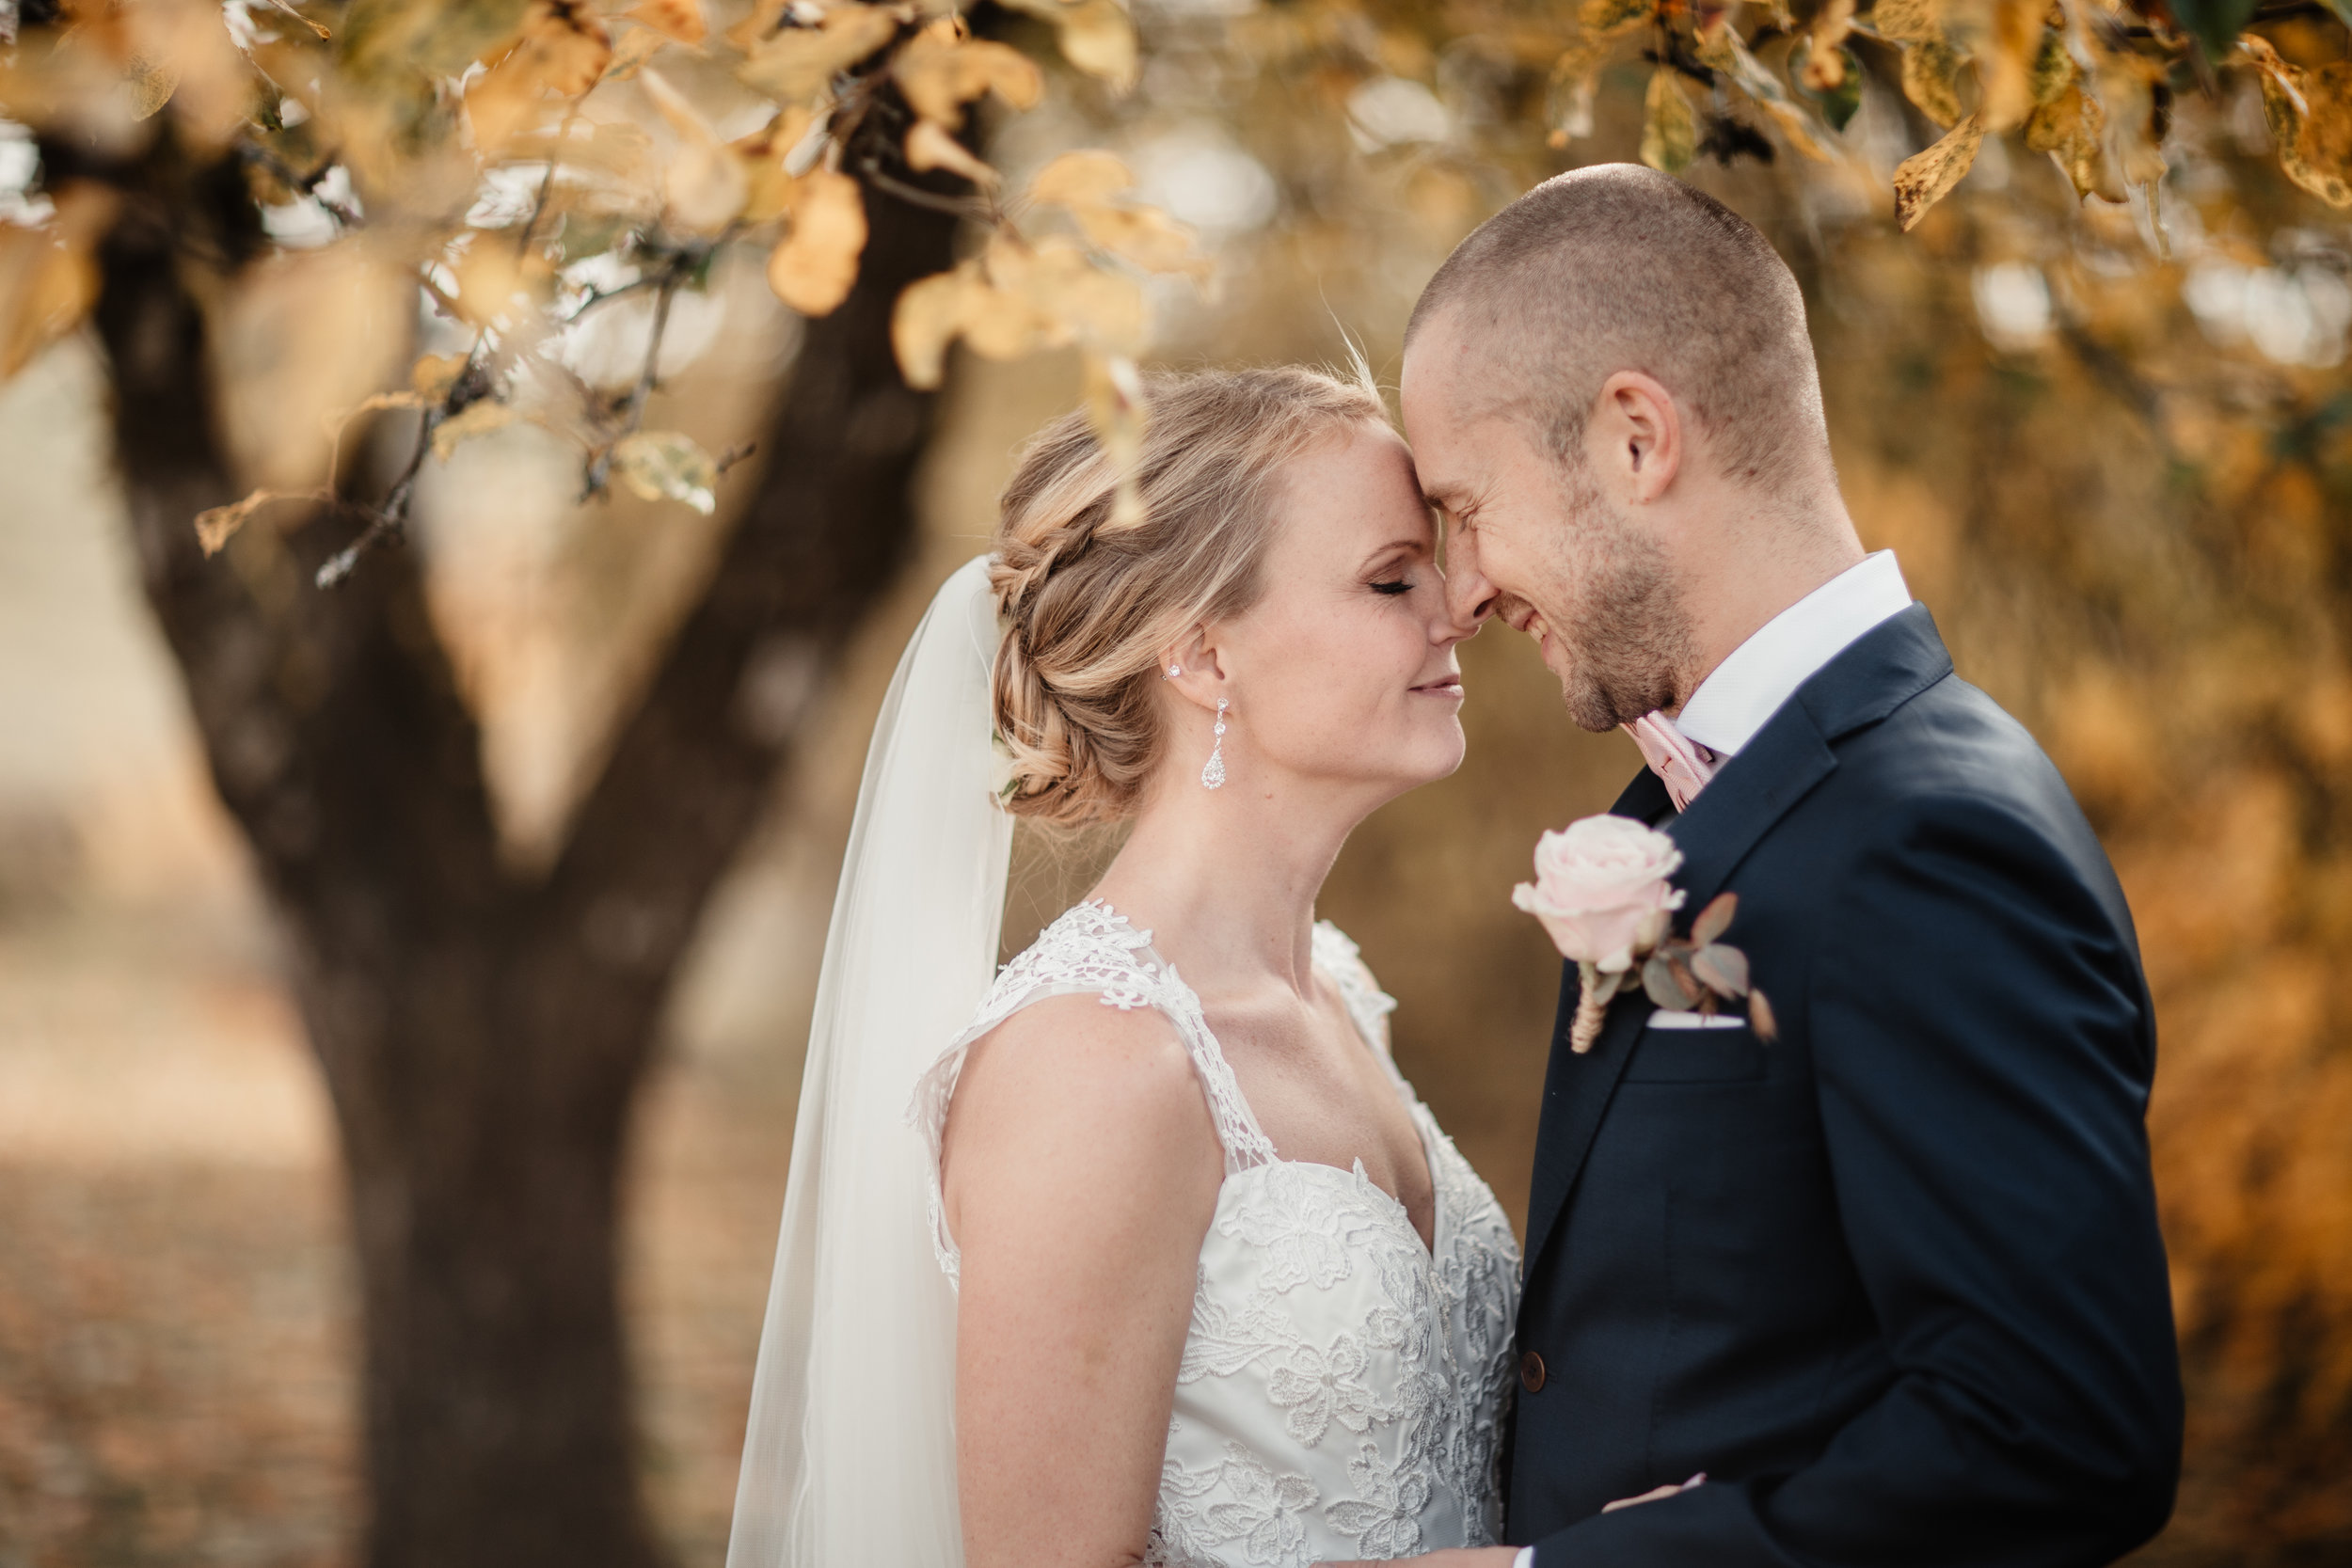 Bröllopsfotograf-Uddetorp Säteri-Höstbröllop-Fotograf Emilia- Bröllopsfotograf Borås-24.jpg